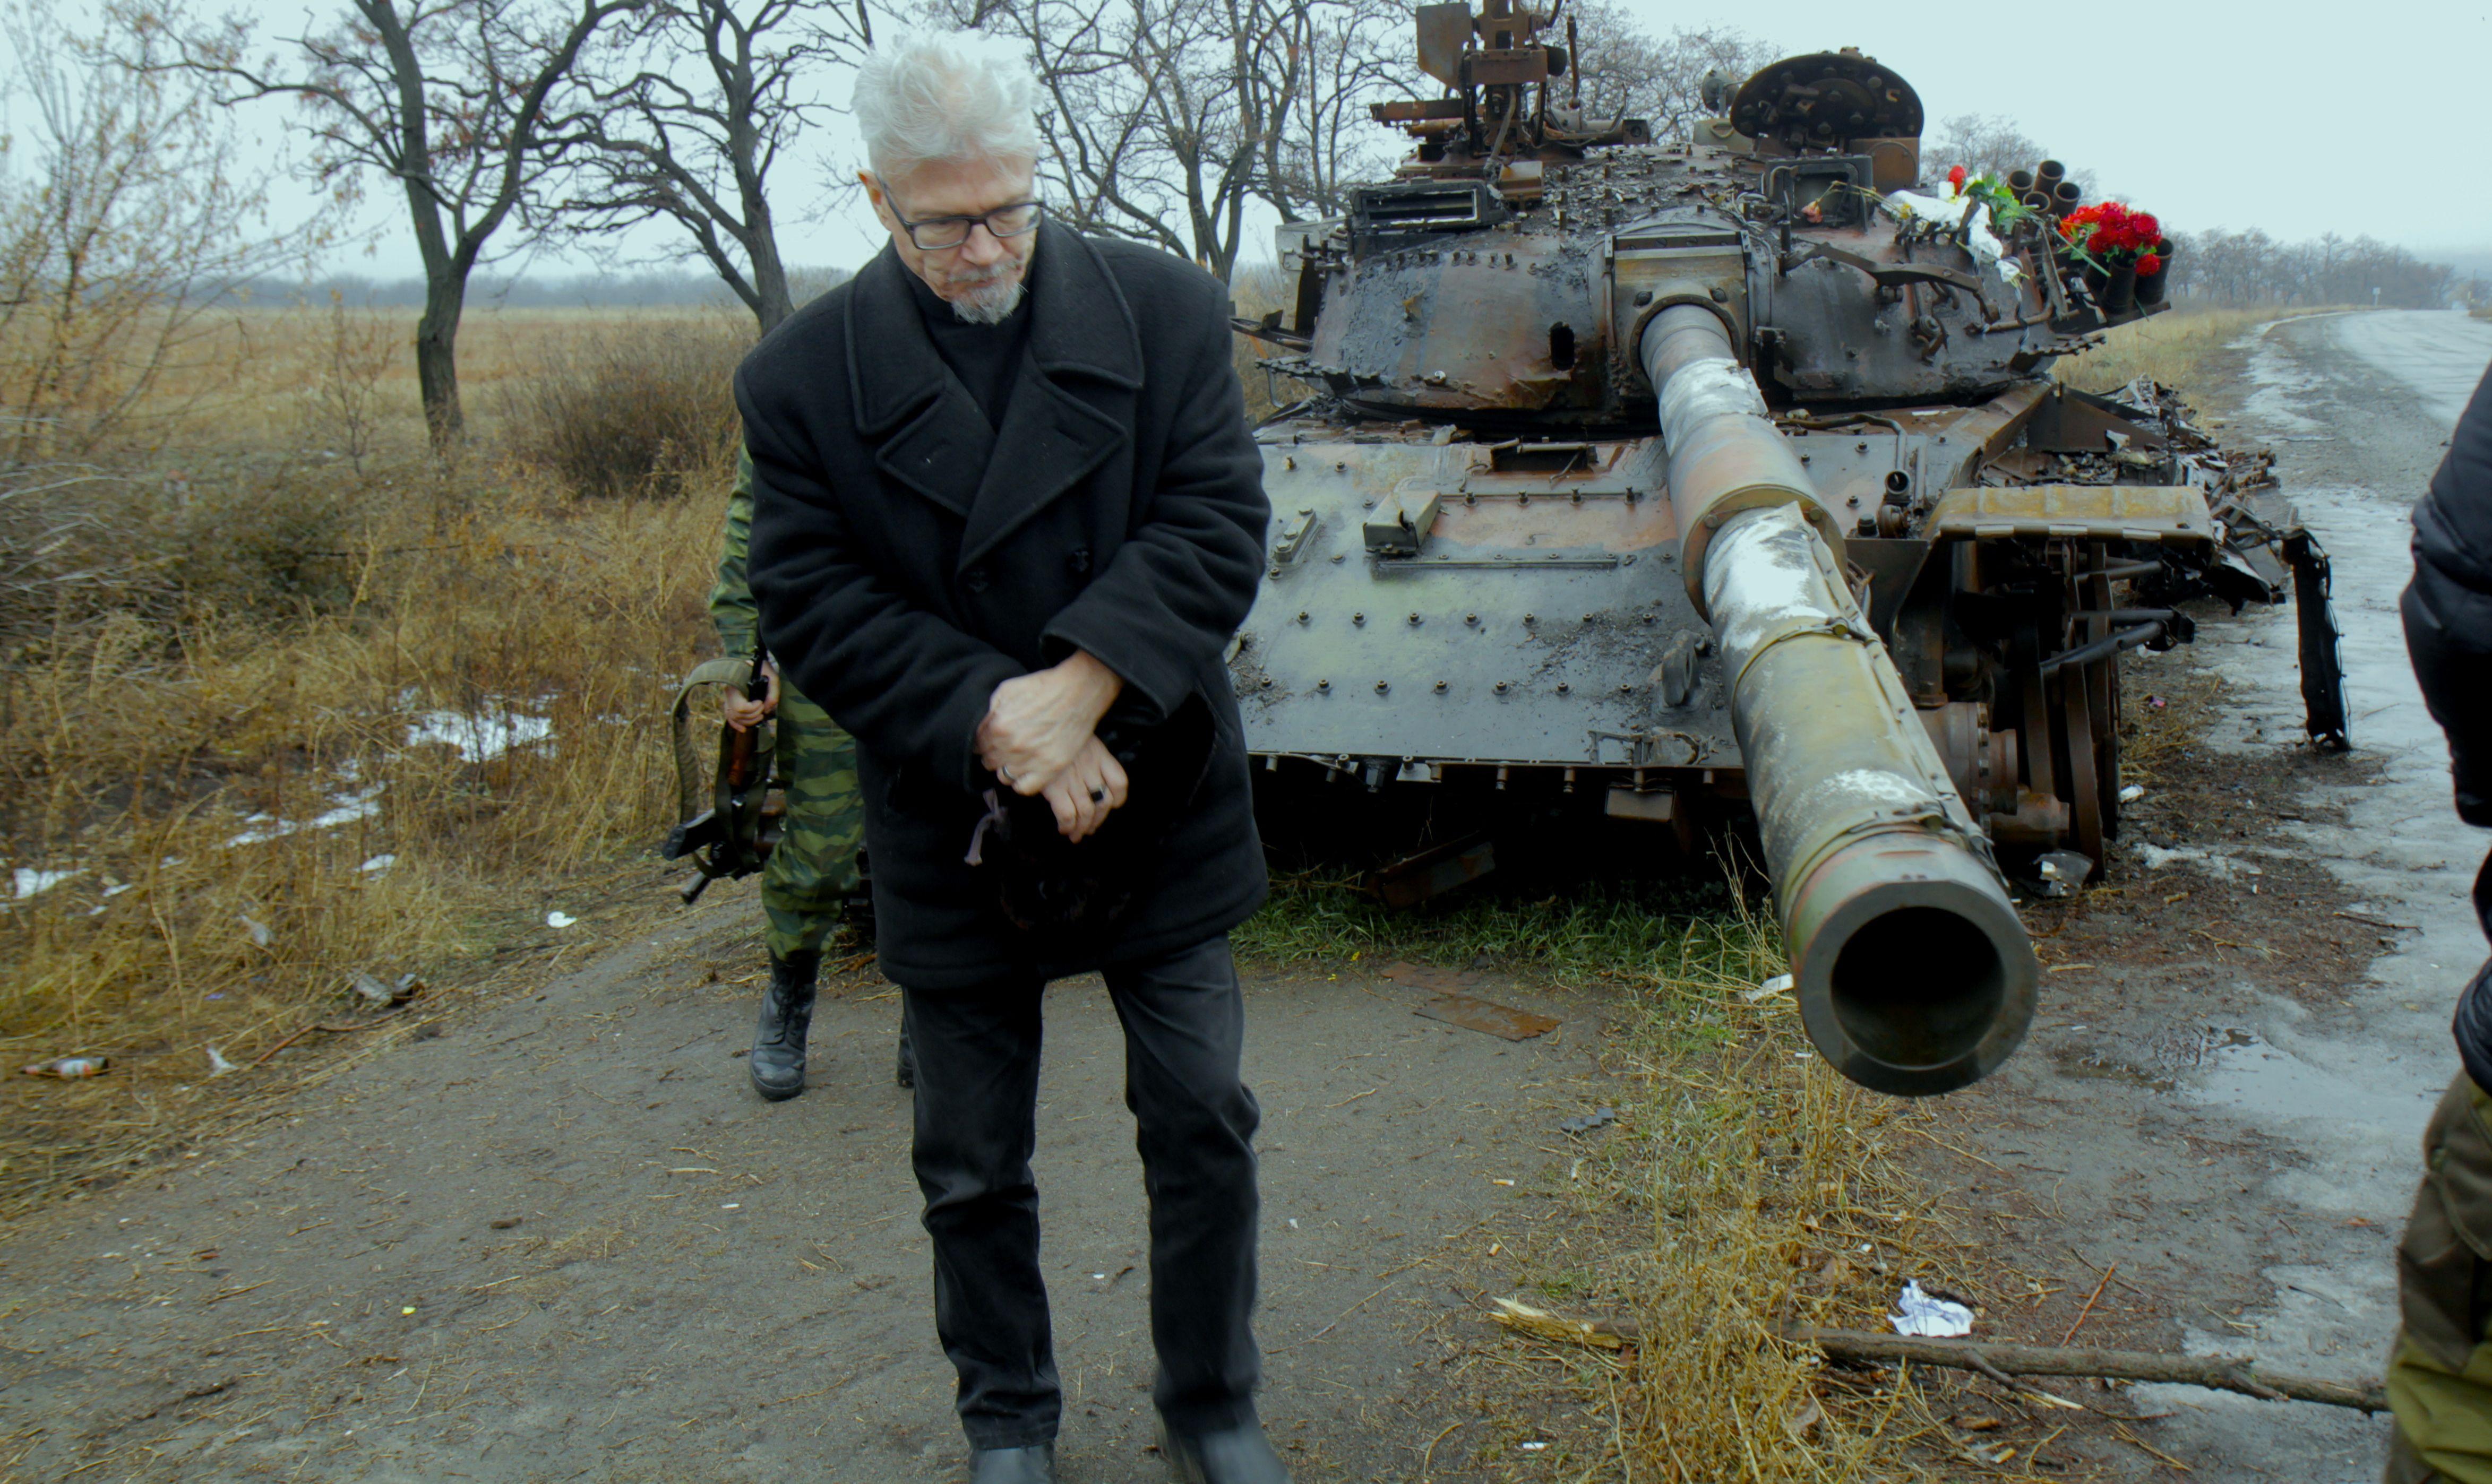 Эдуард Лимонов у подбитого танка